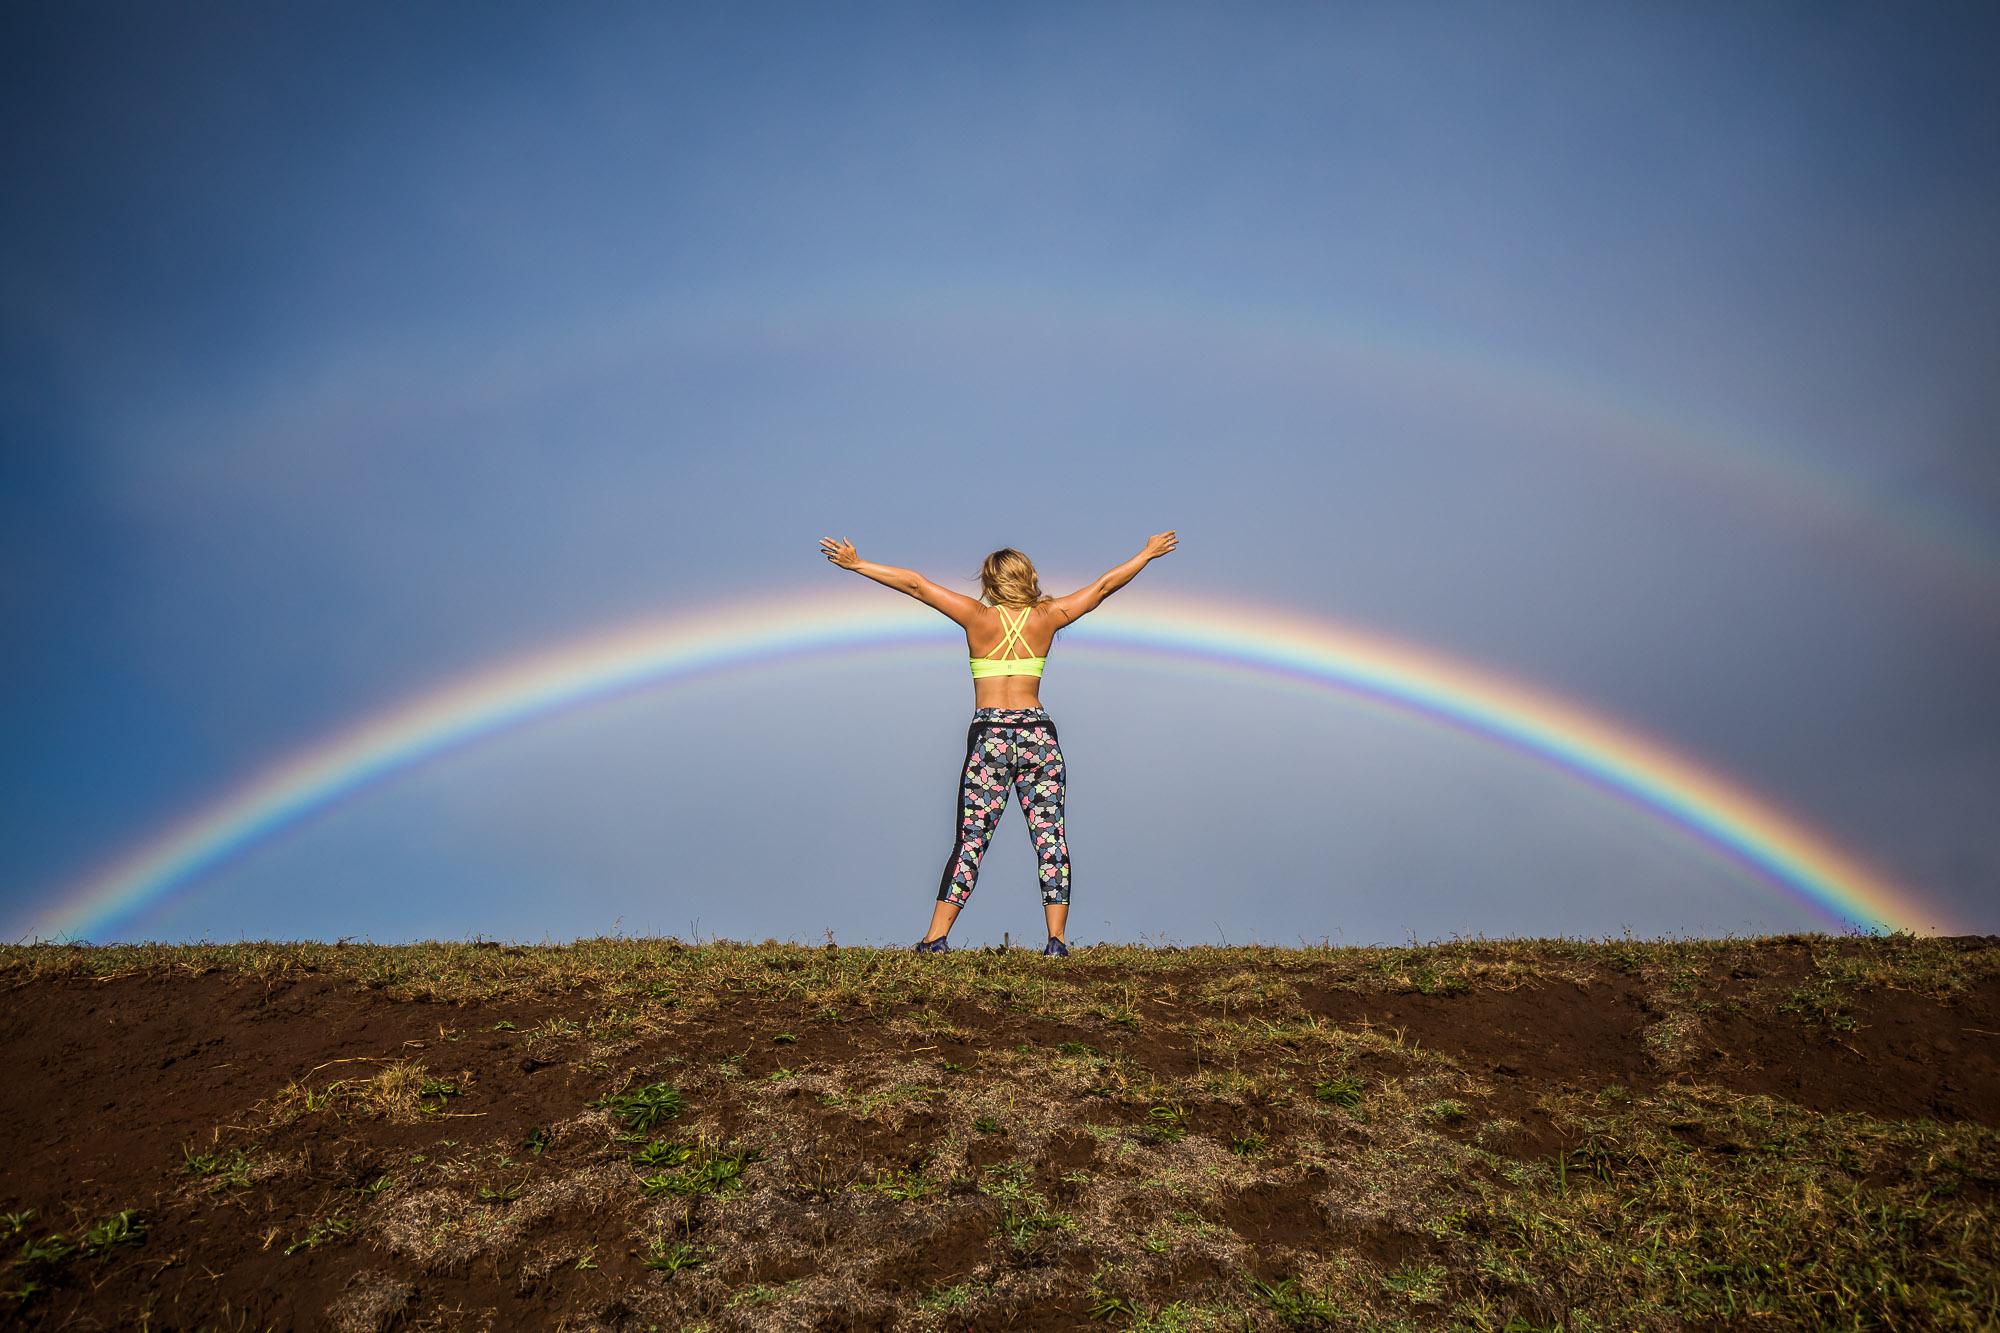 DOUBLE RAINBOW!!PC: Michael Hannig